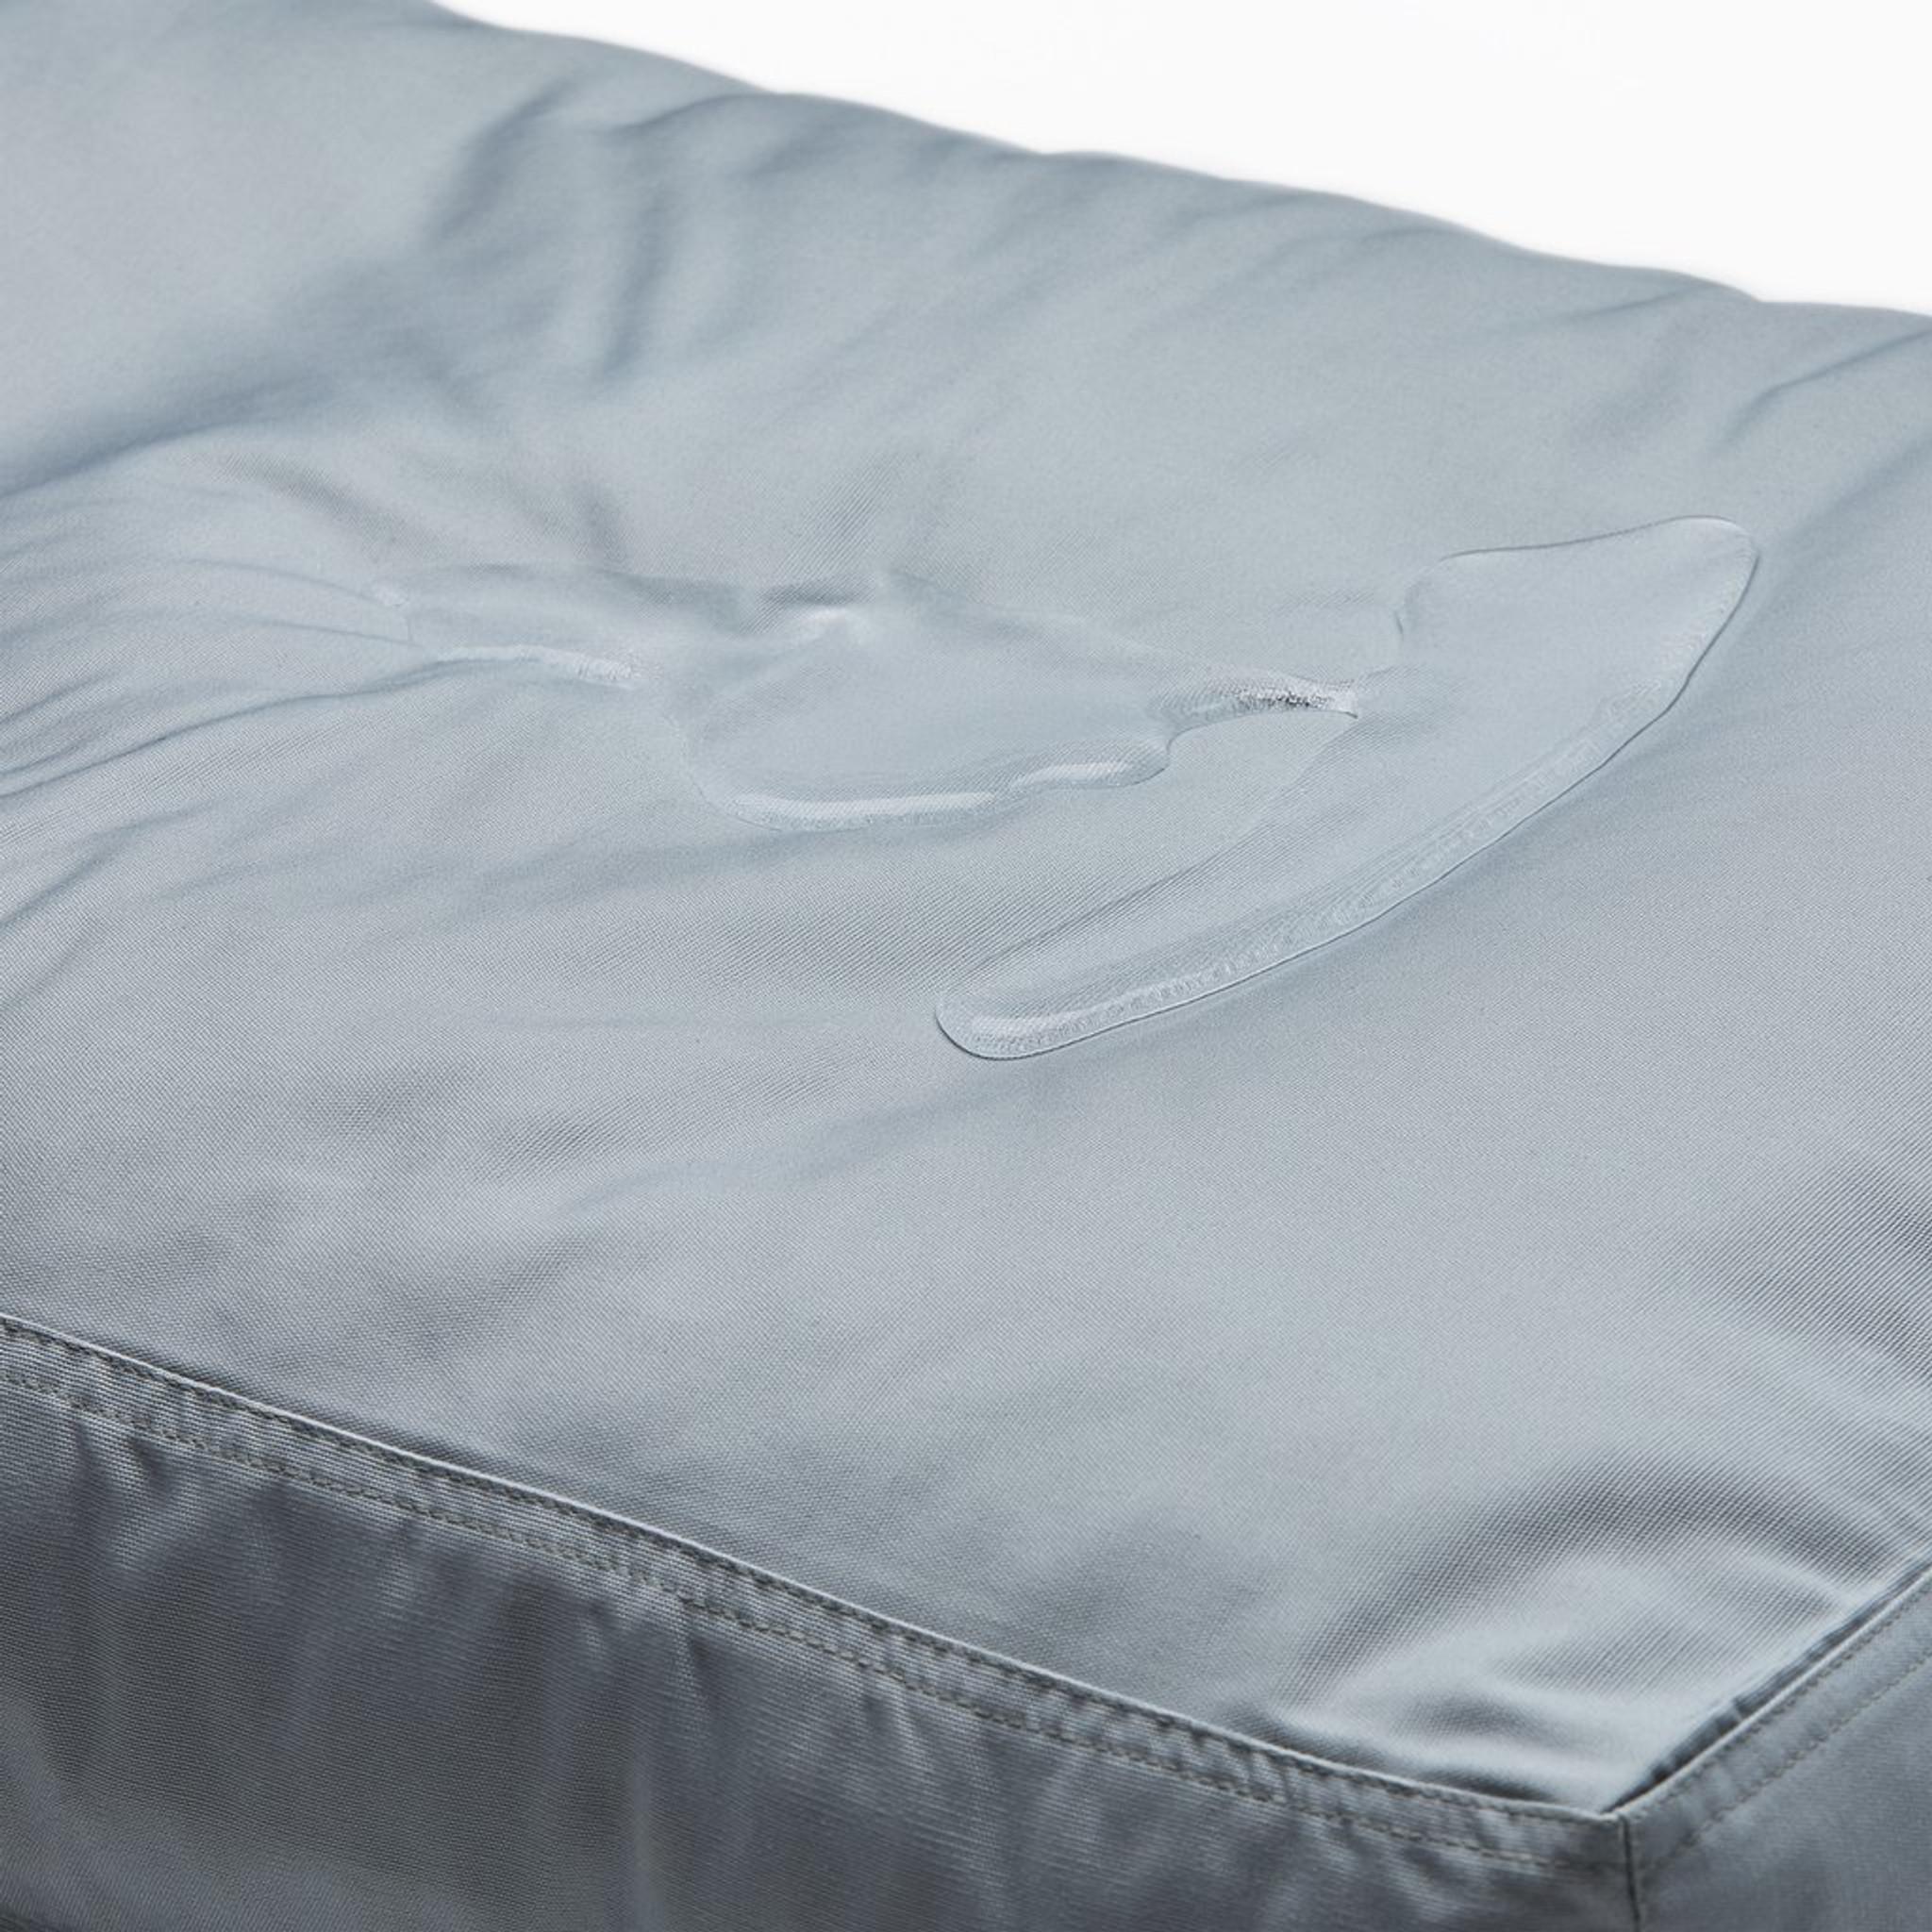 fable pet bed cushion waterproof indoor outdoor modern simple grey